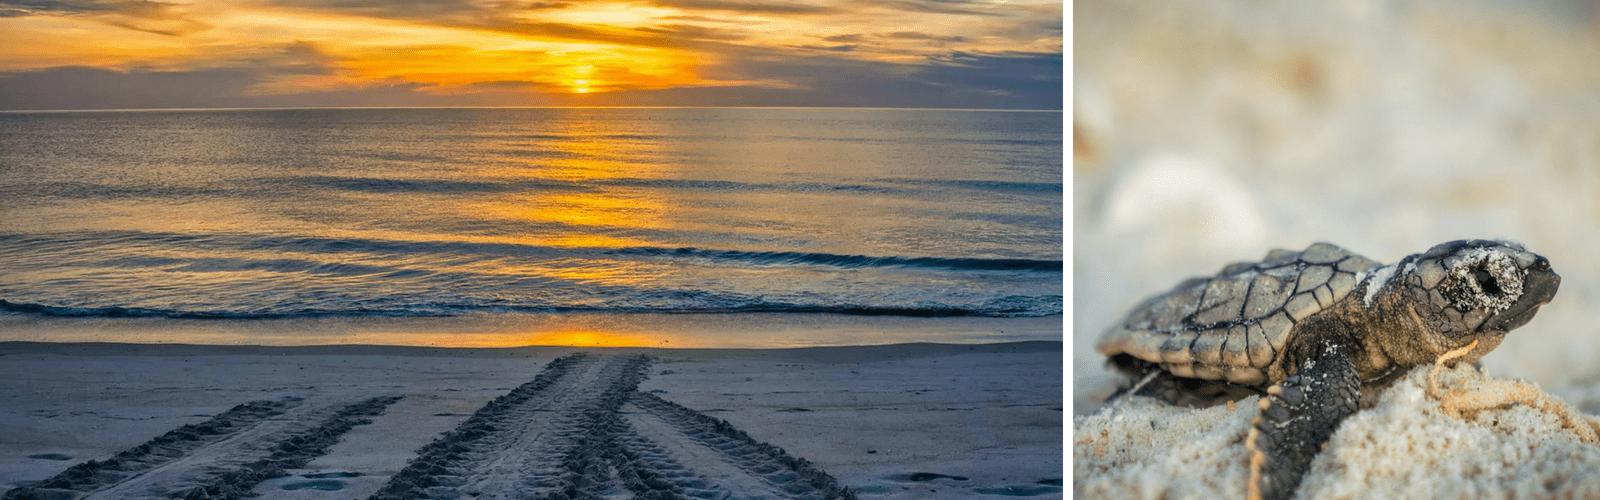 Sarasota Sea turtle hatchling and tracks in sand